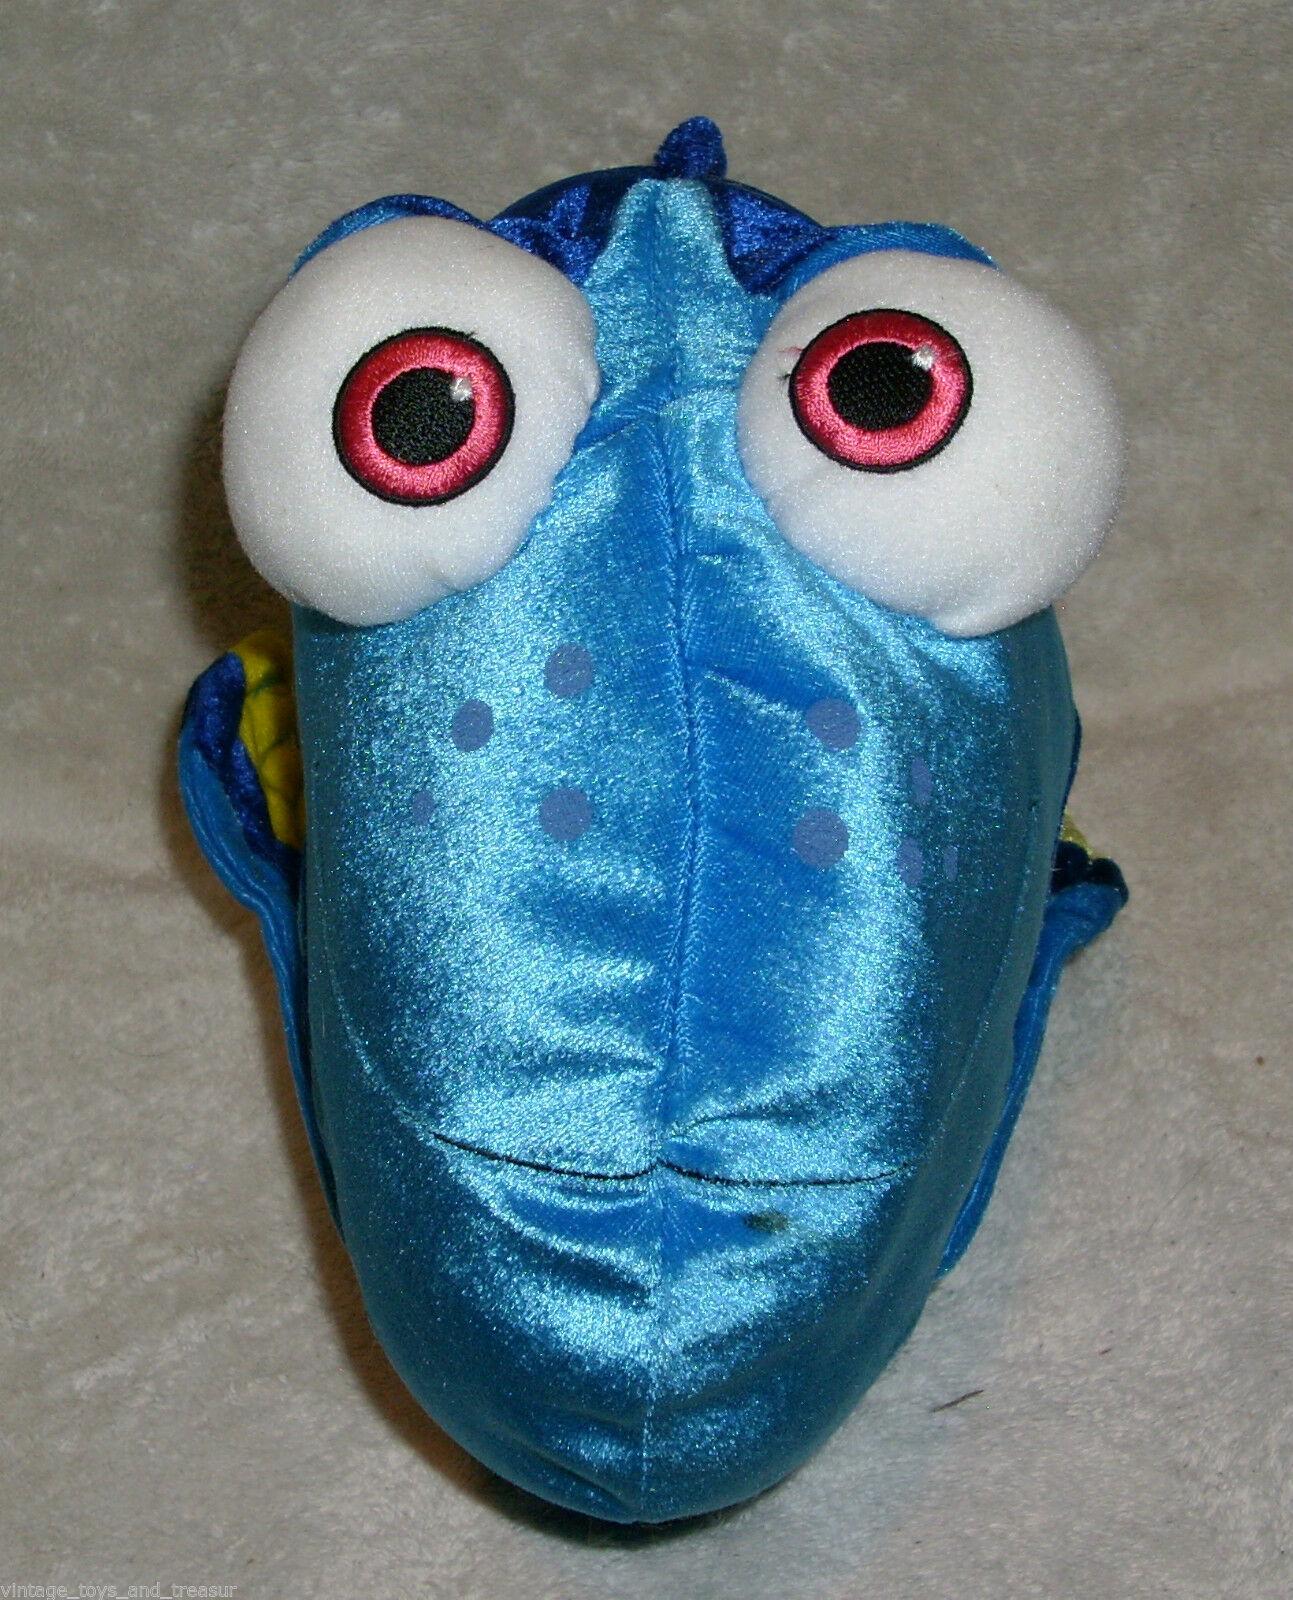 "12"" DISNEY STORE PIXAR FINDING NEMO DORY BLUE GIRL FISH STUFFED ANIMAL PLUSH TOY"